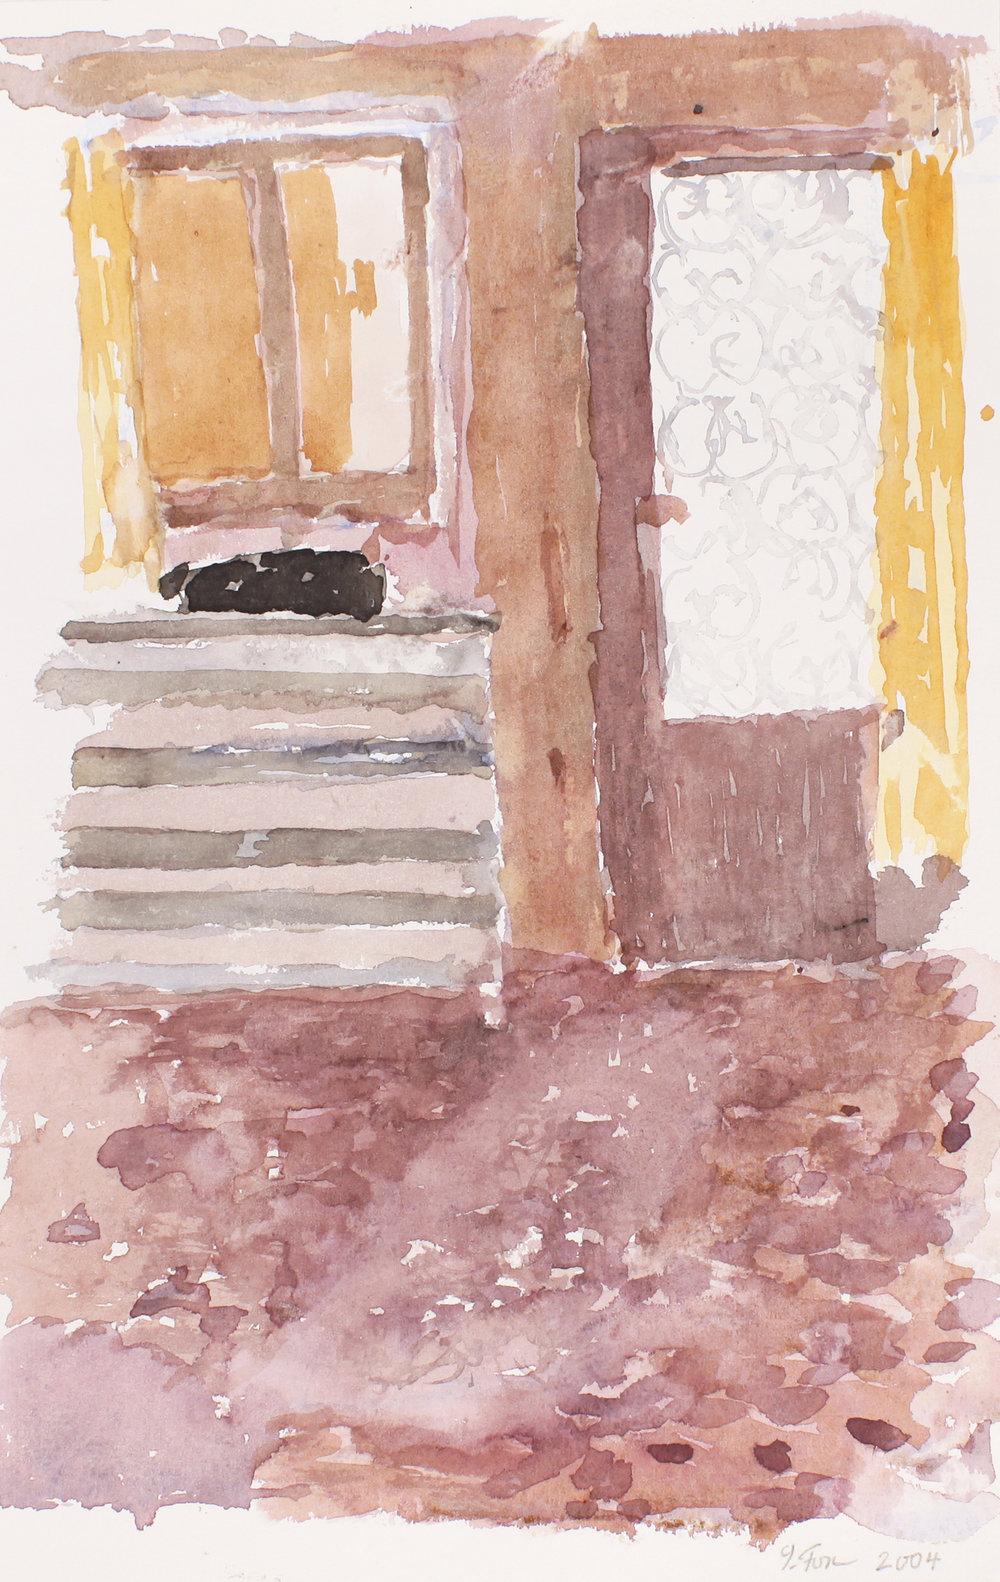 Studio, Venice